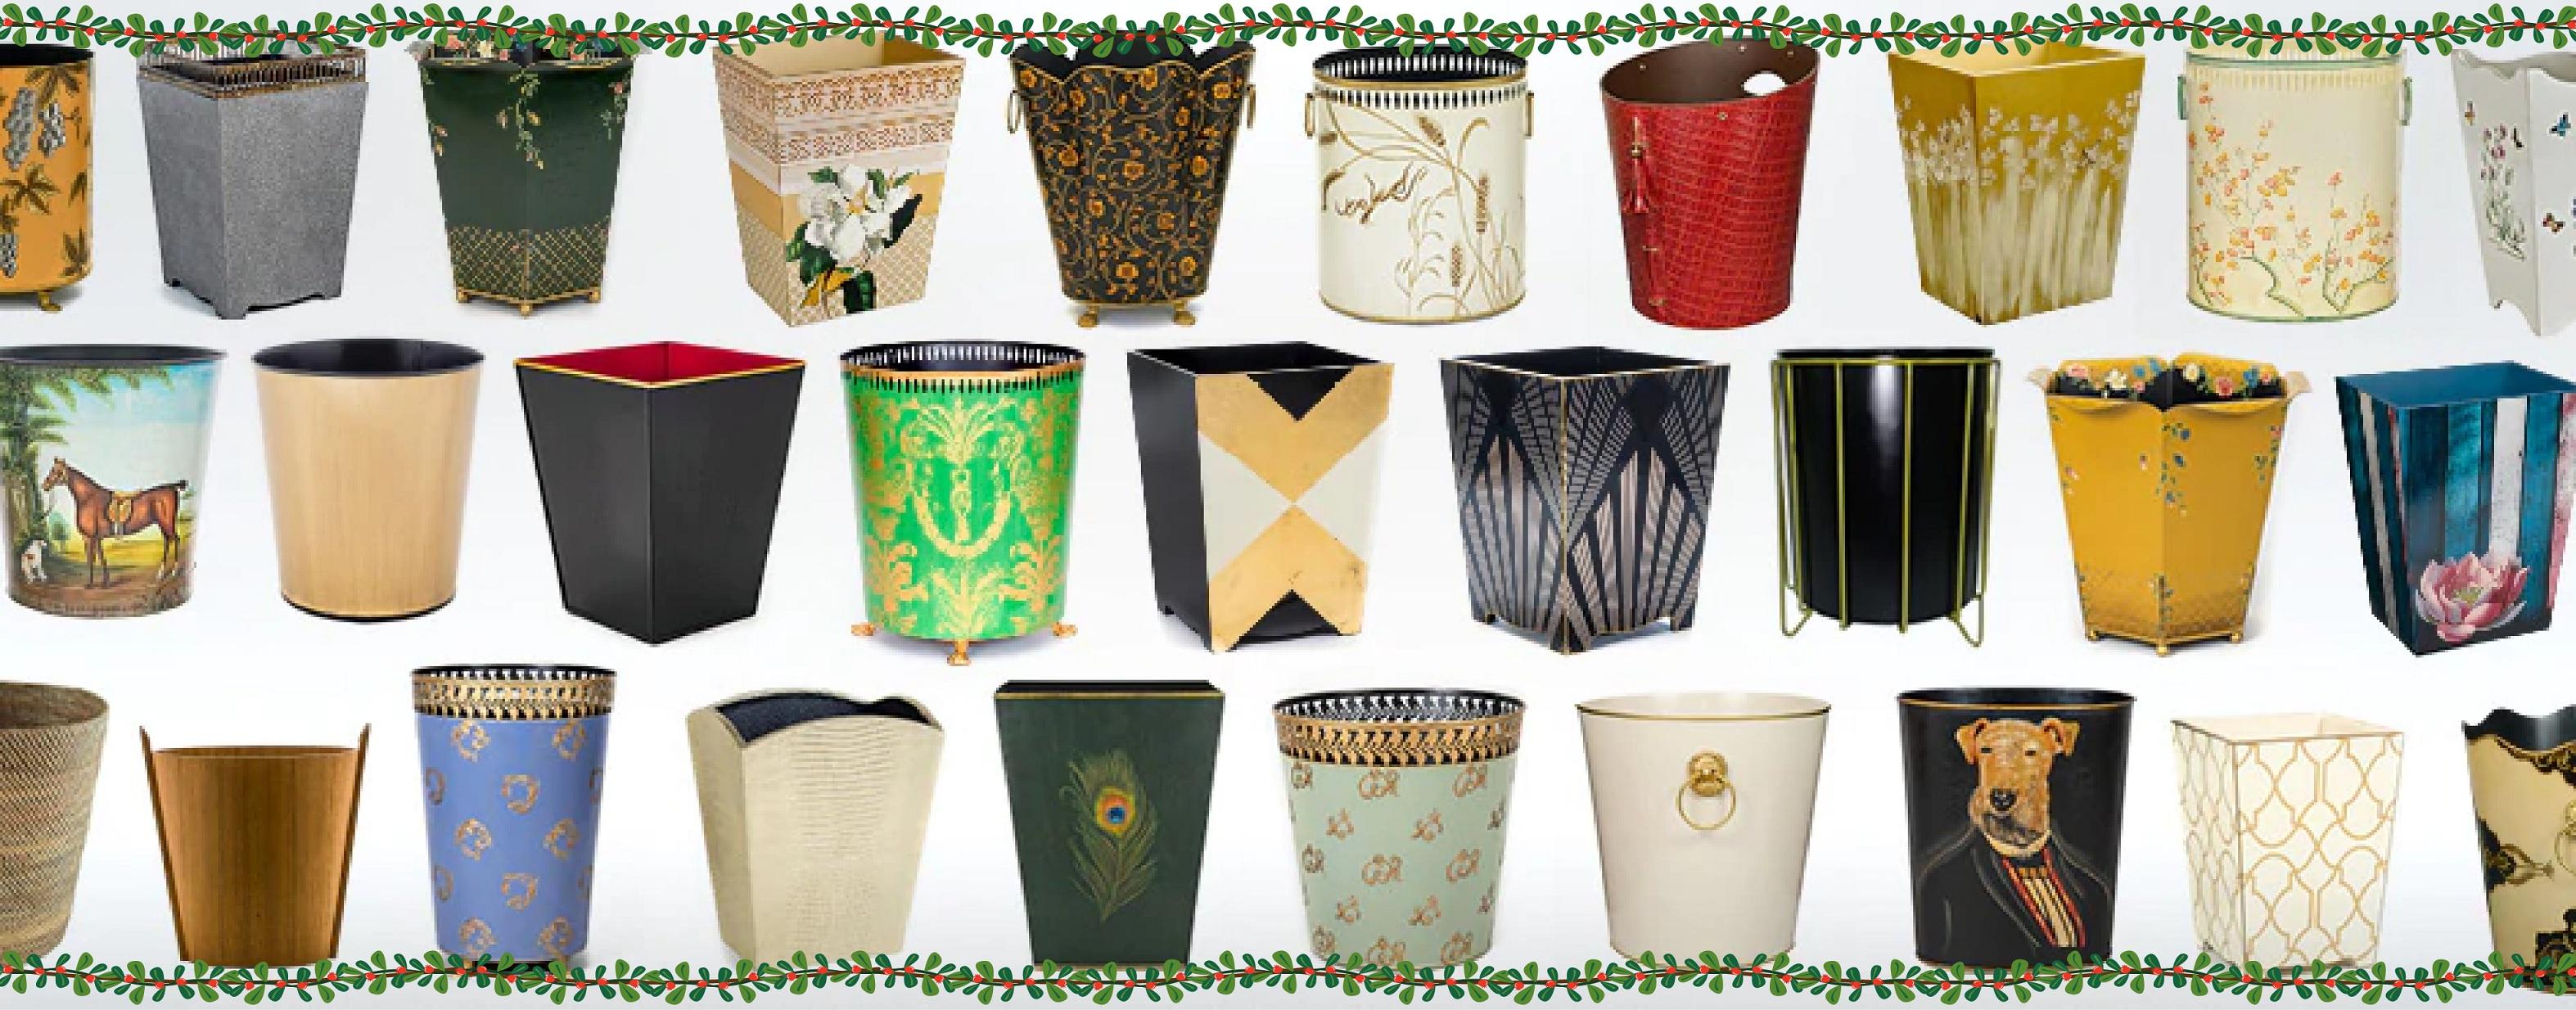 Pretty Decorative Luxury Waste Paper Bins Baskets Trash Cans (metal, wood, rattan)     Must Have Bins